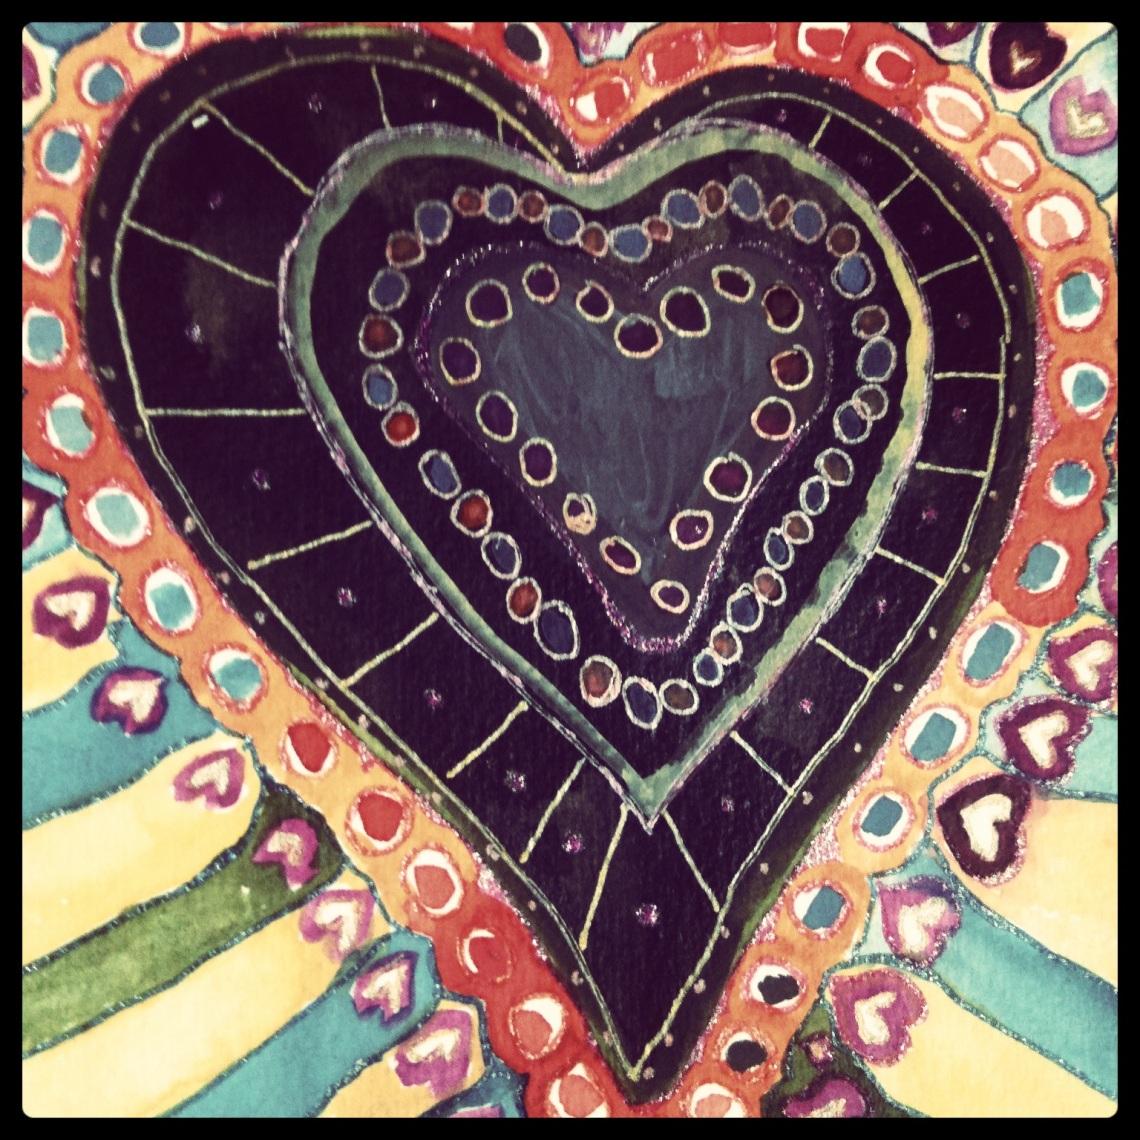 black heart (c) 2013